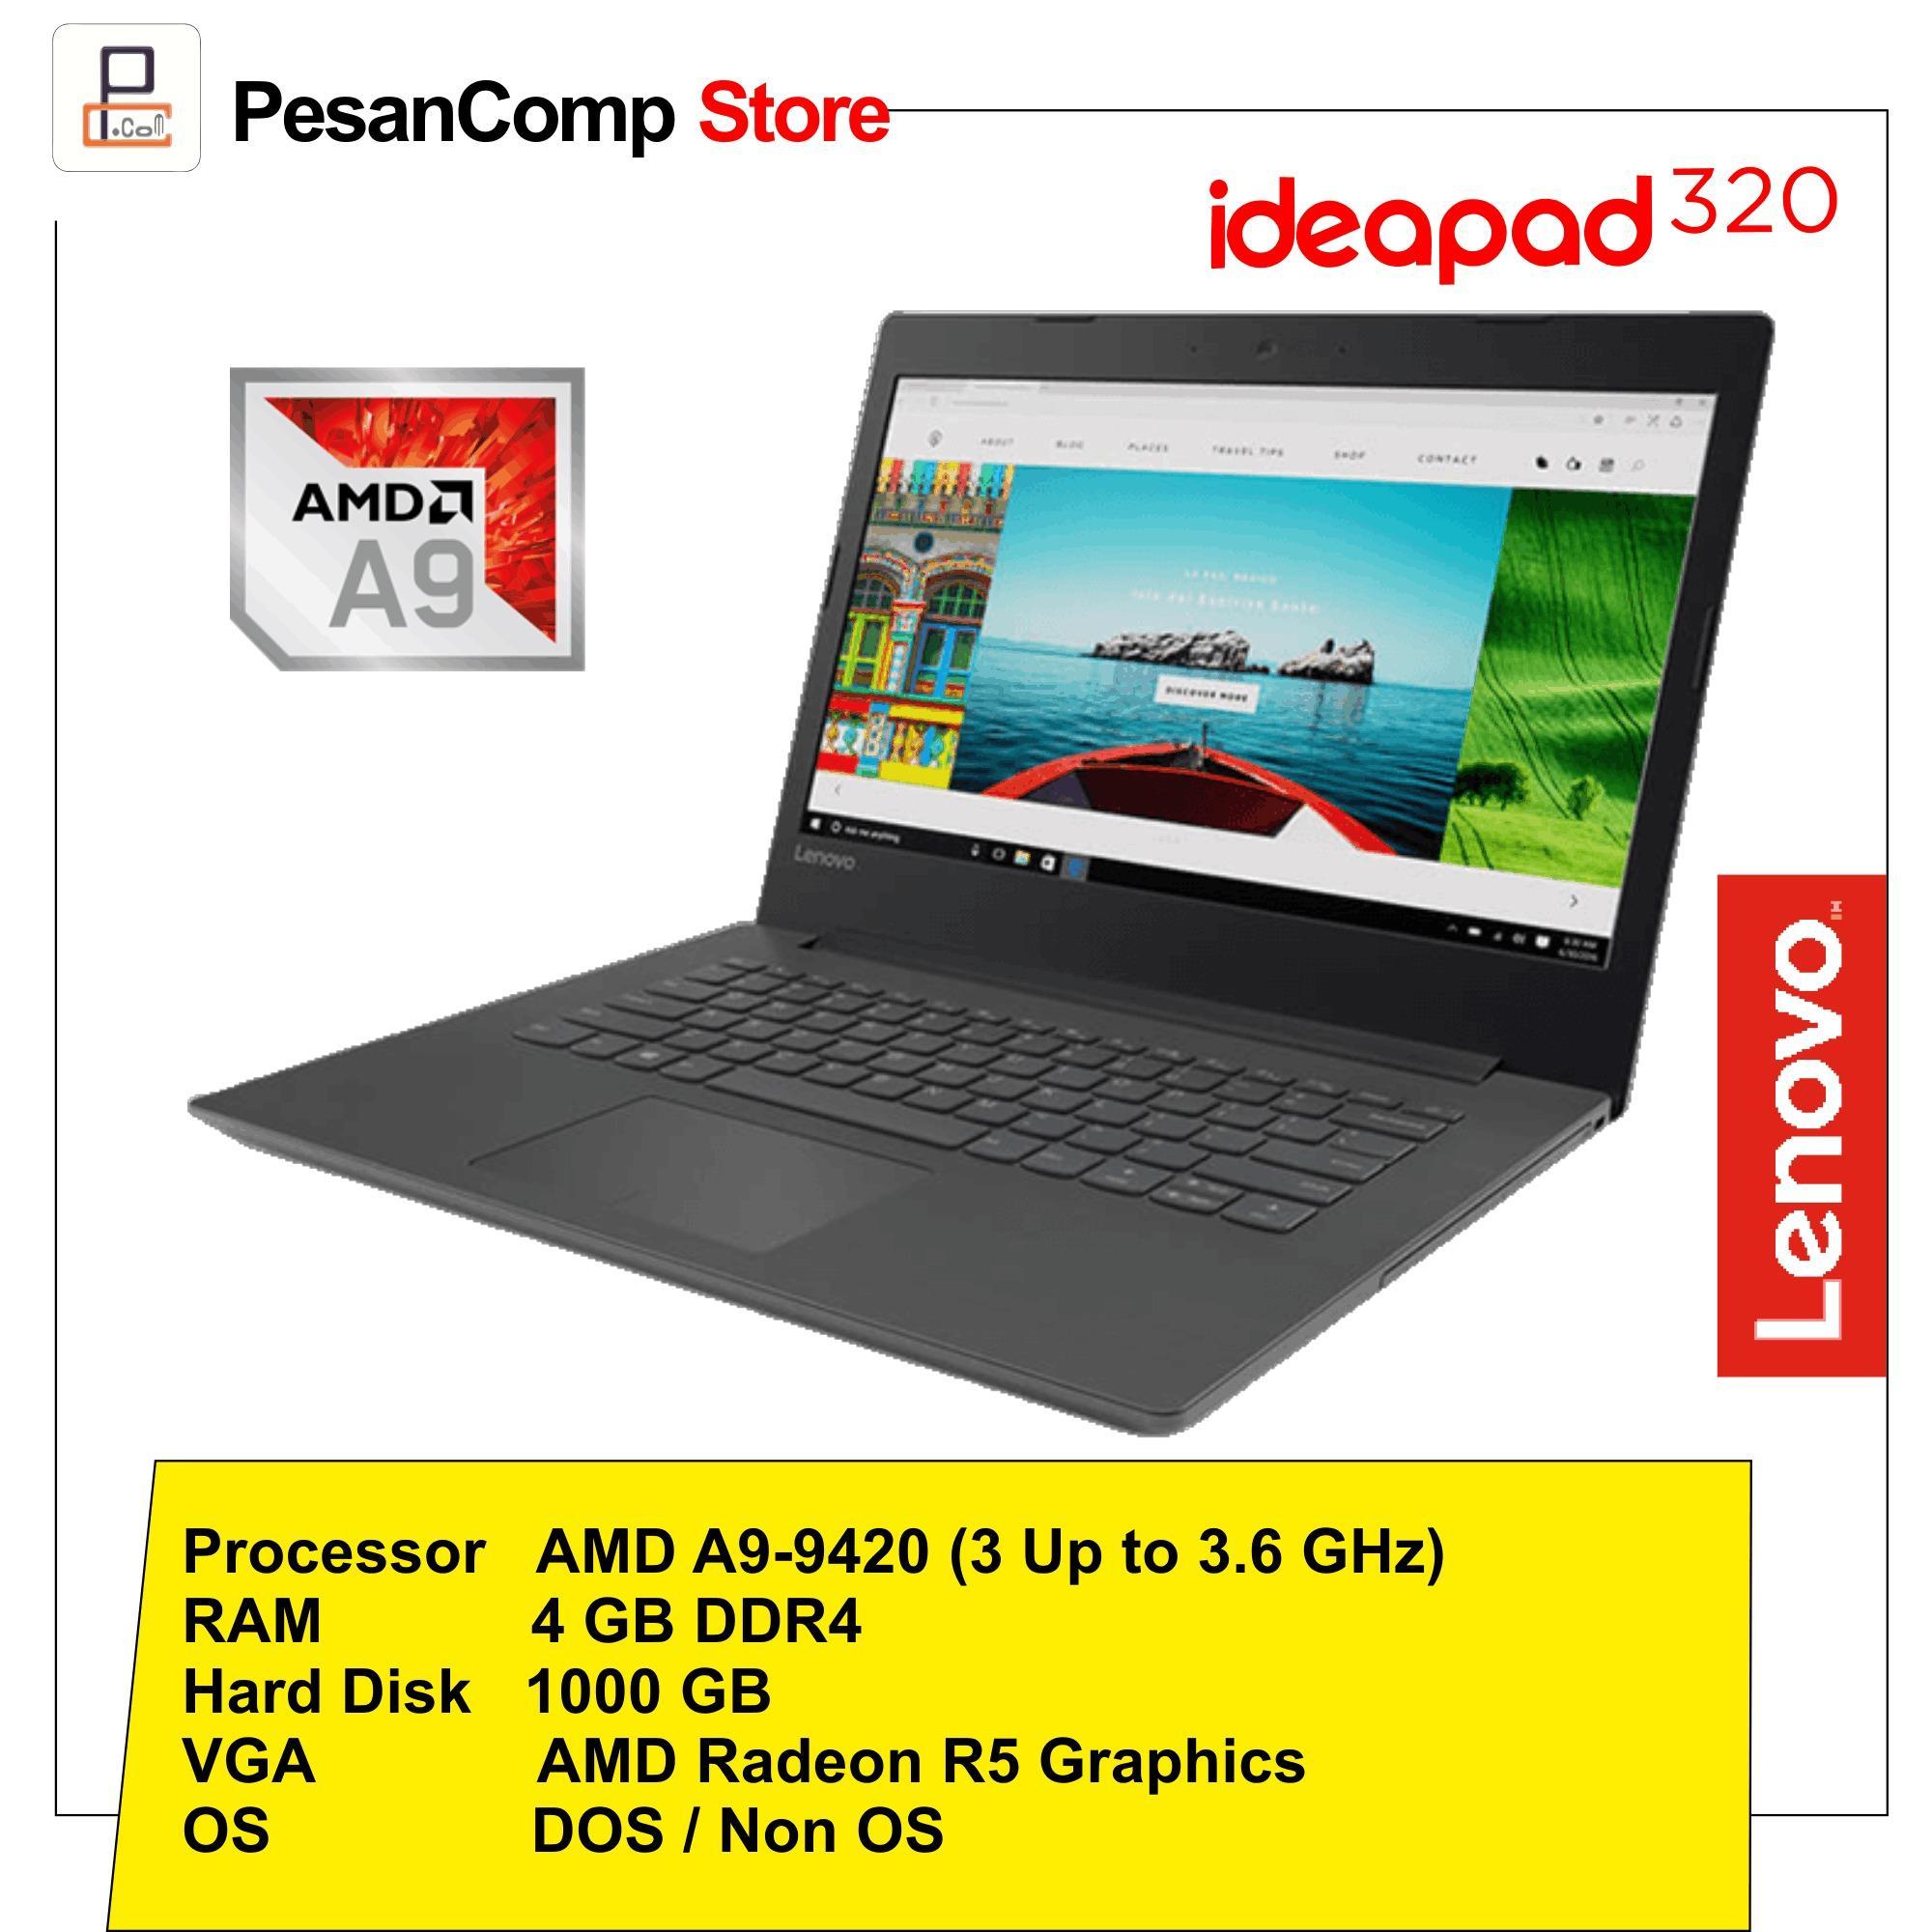 No Asus Rog Gl 552 X Dm409t Core I7 7700 4096mb 1tb N Vidia Gtx950 Lenovo Ideapad 320 Amd A9 9420 Radeon R5 Integrated Graphics